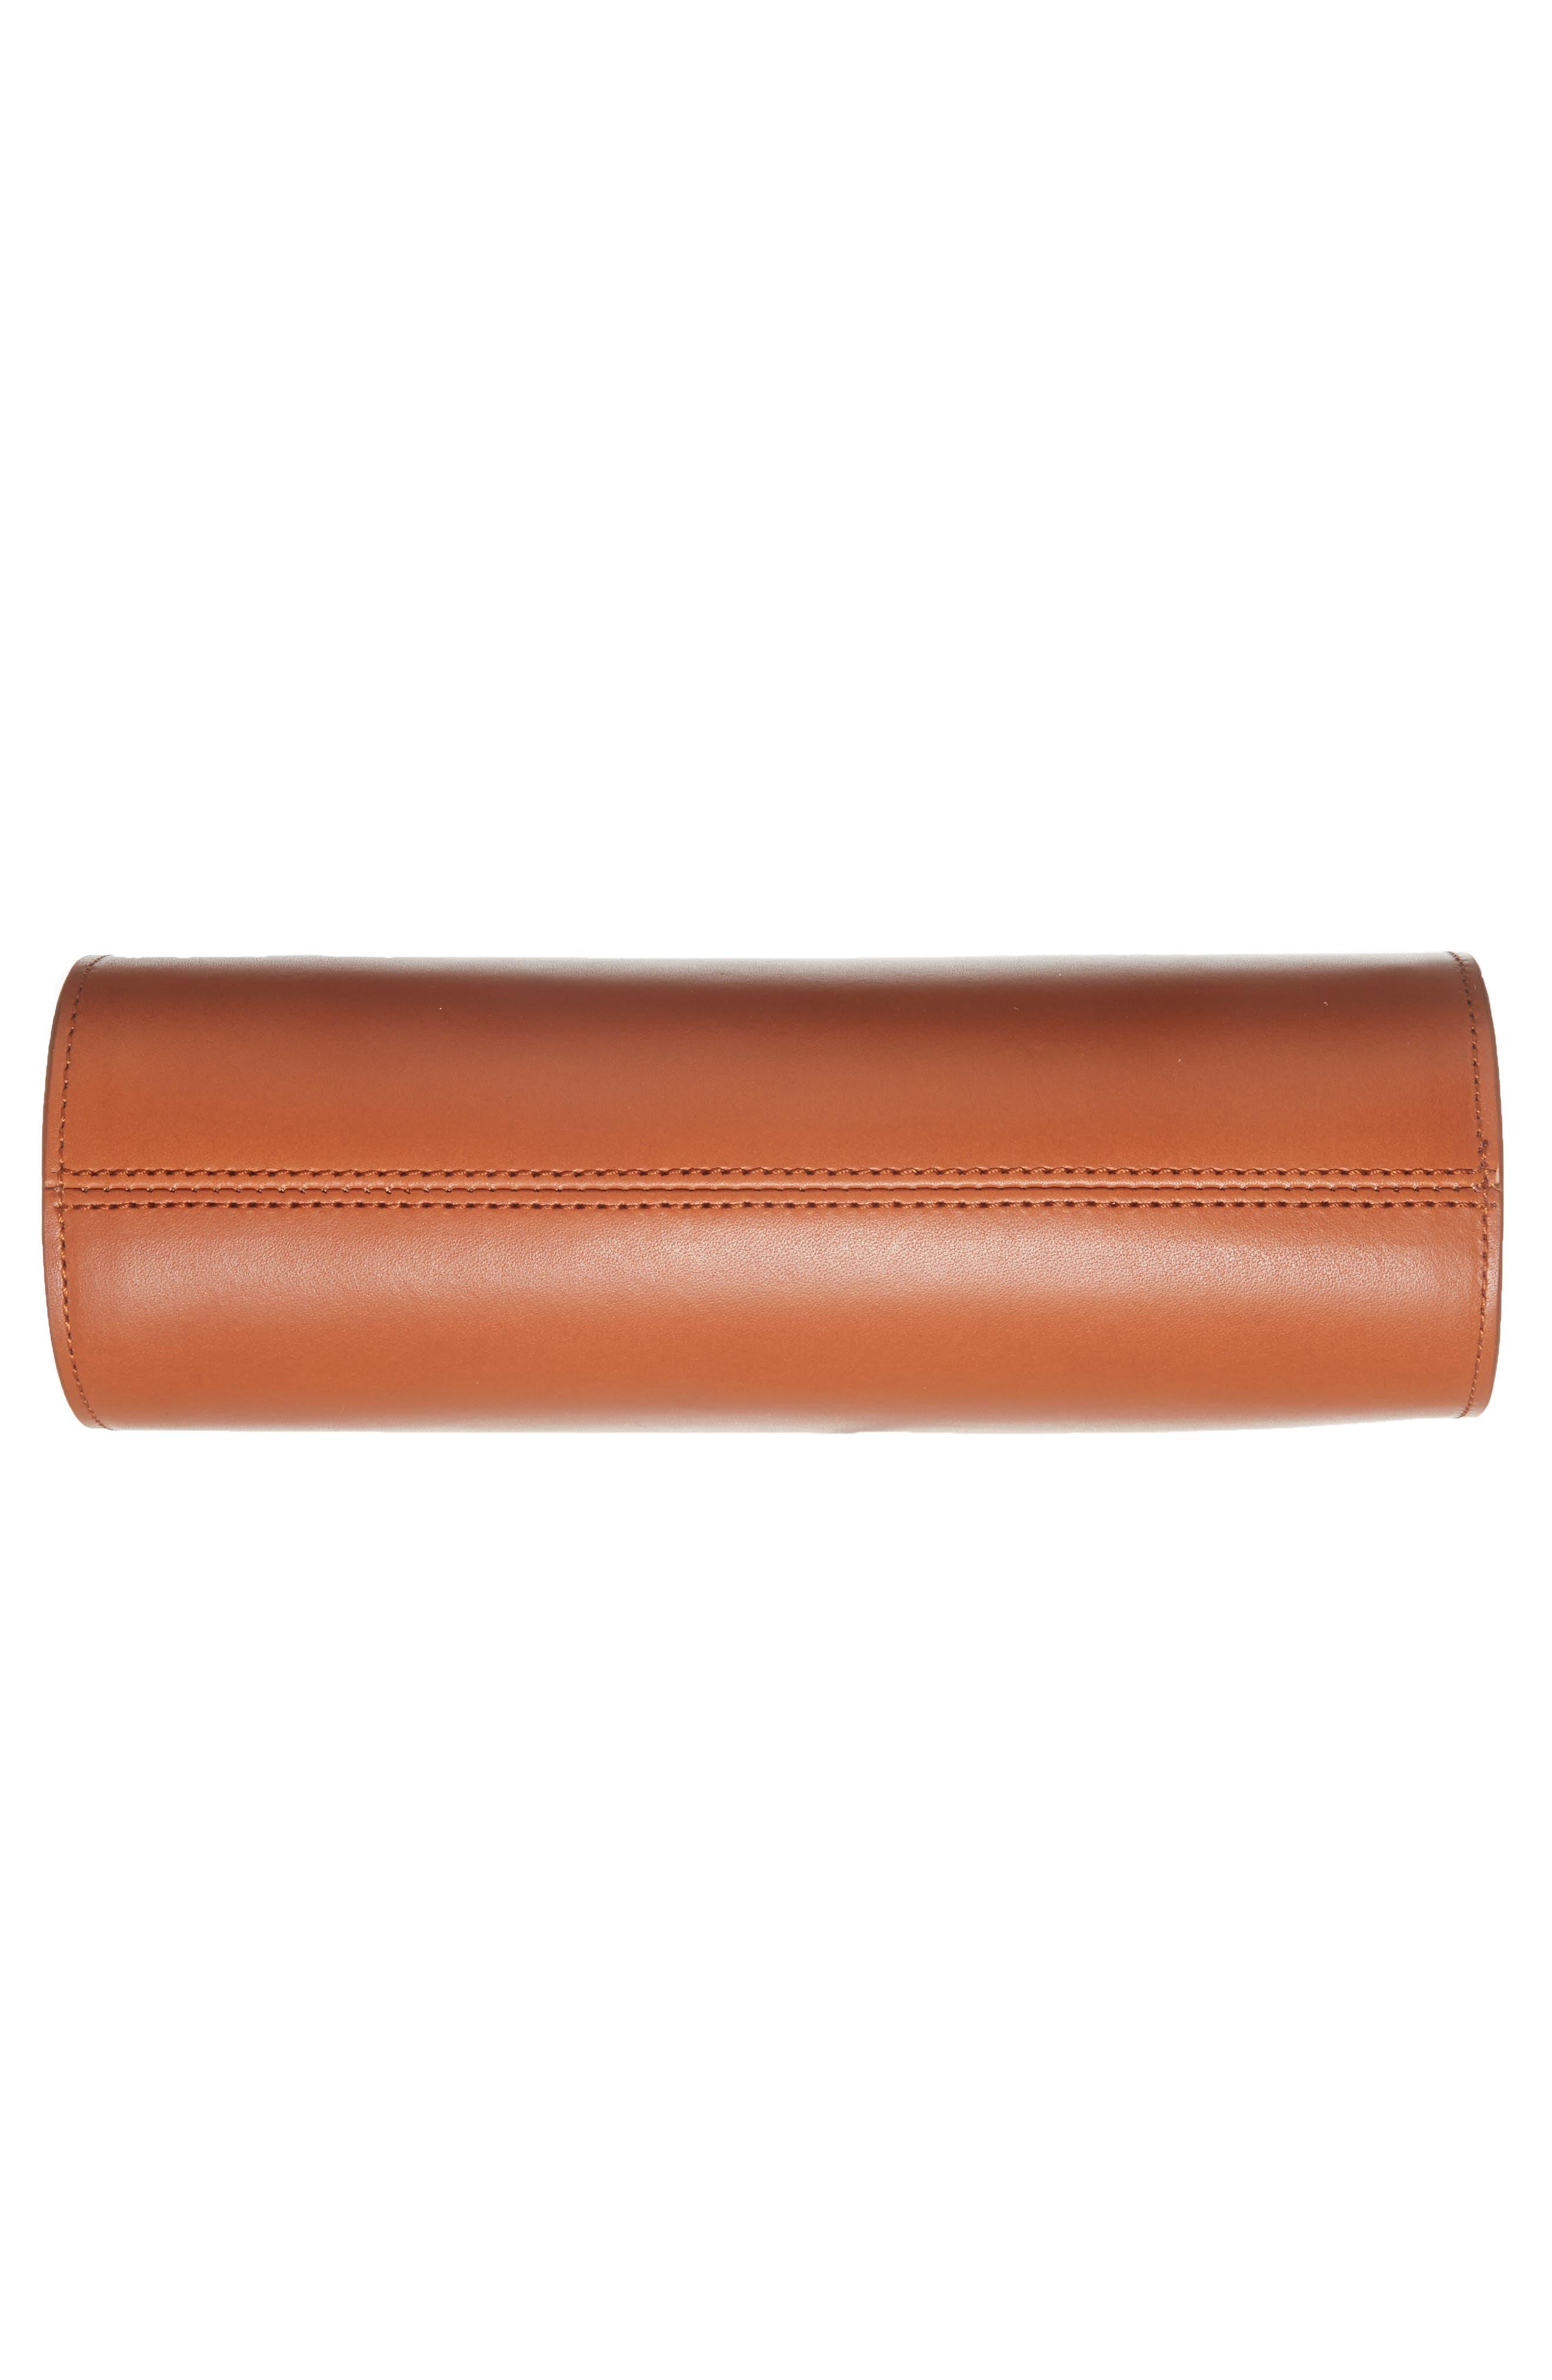 Sac Demi Lune Leather Crossbody Bag,                             Alternate thumbnail 4, color,                             Caramel